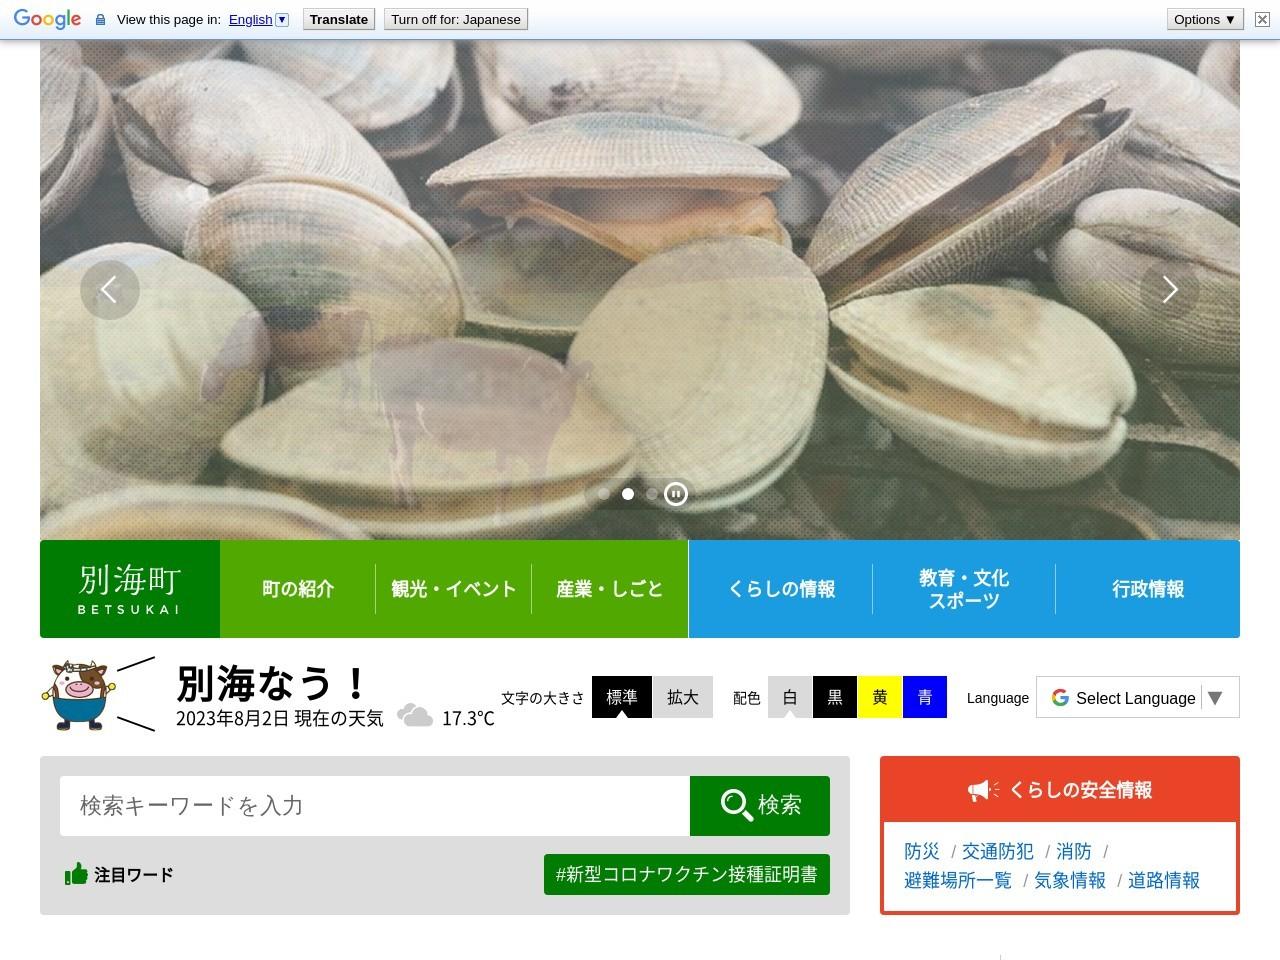 http://betsukai.jp/